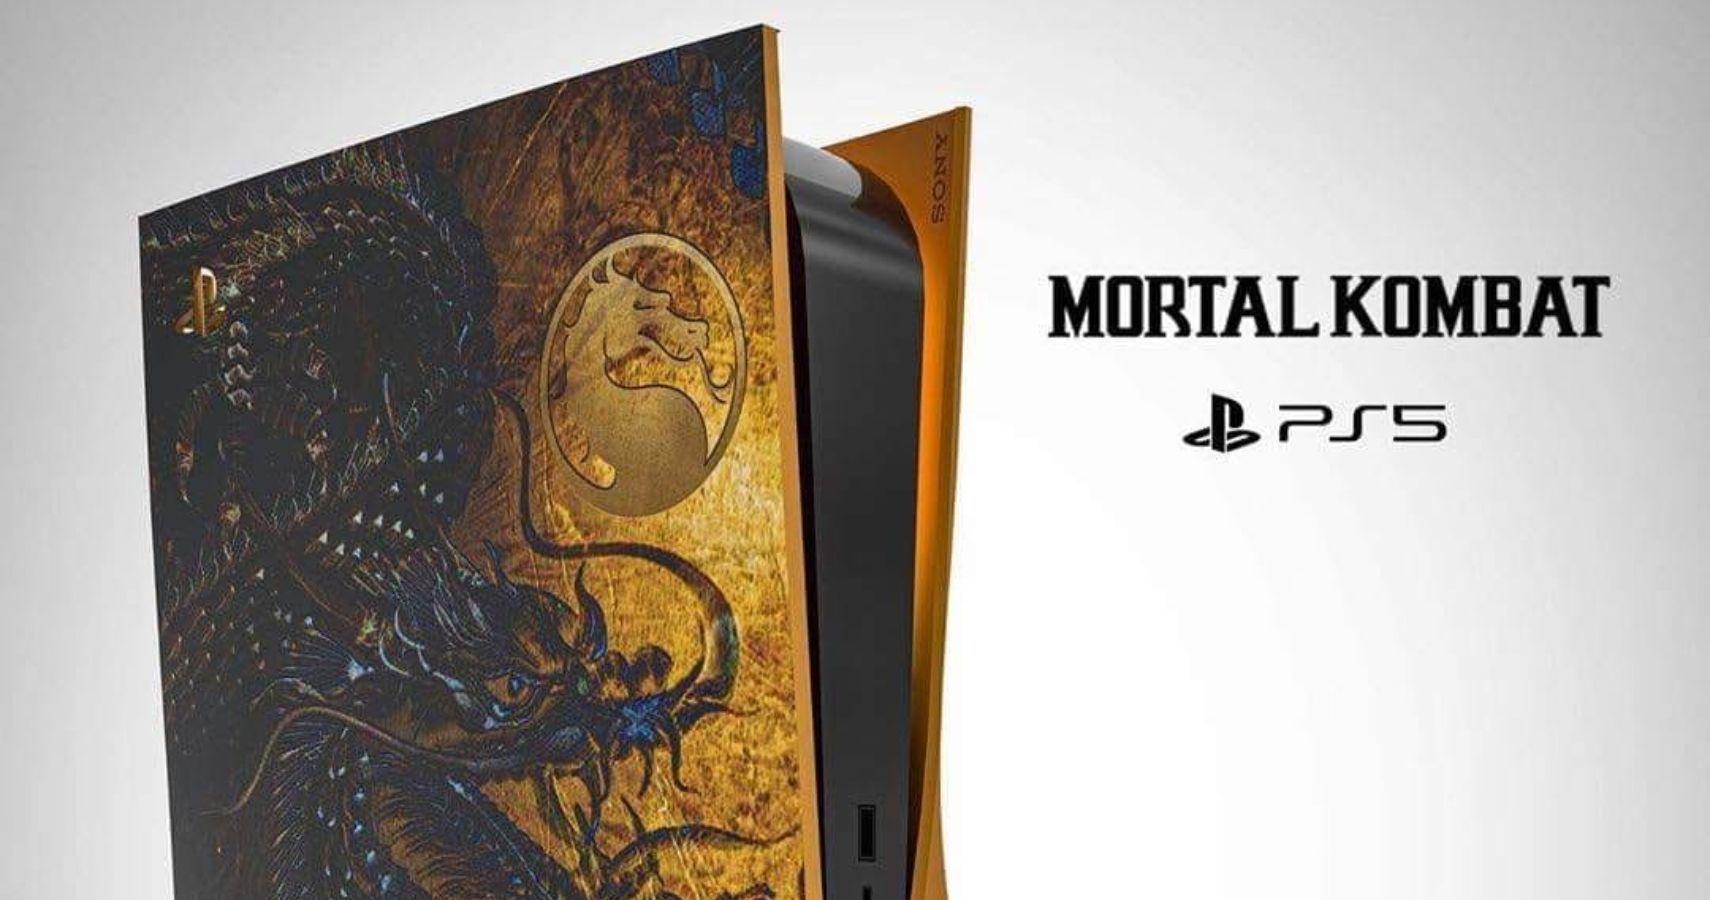 Xbox Pope Reveals Concept Art For Mortal Kombat Ps5 Skin